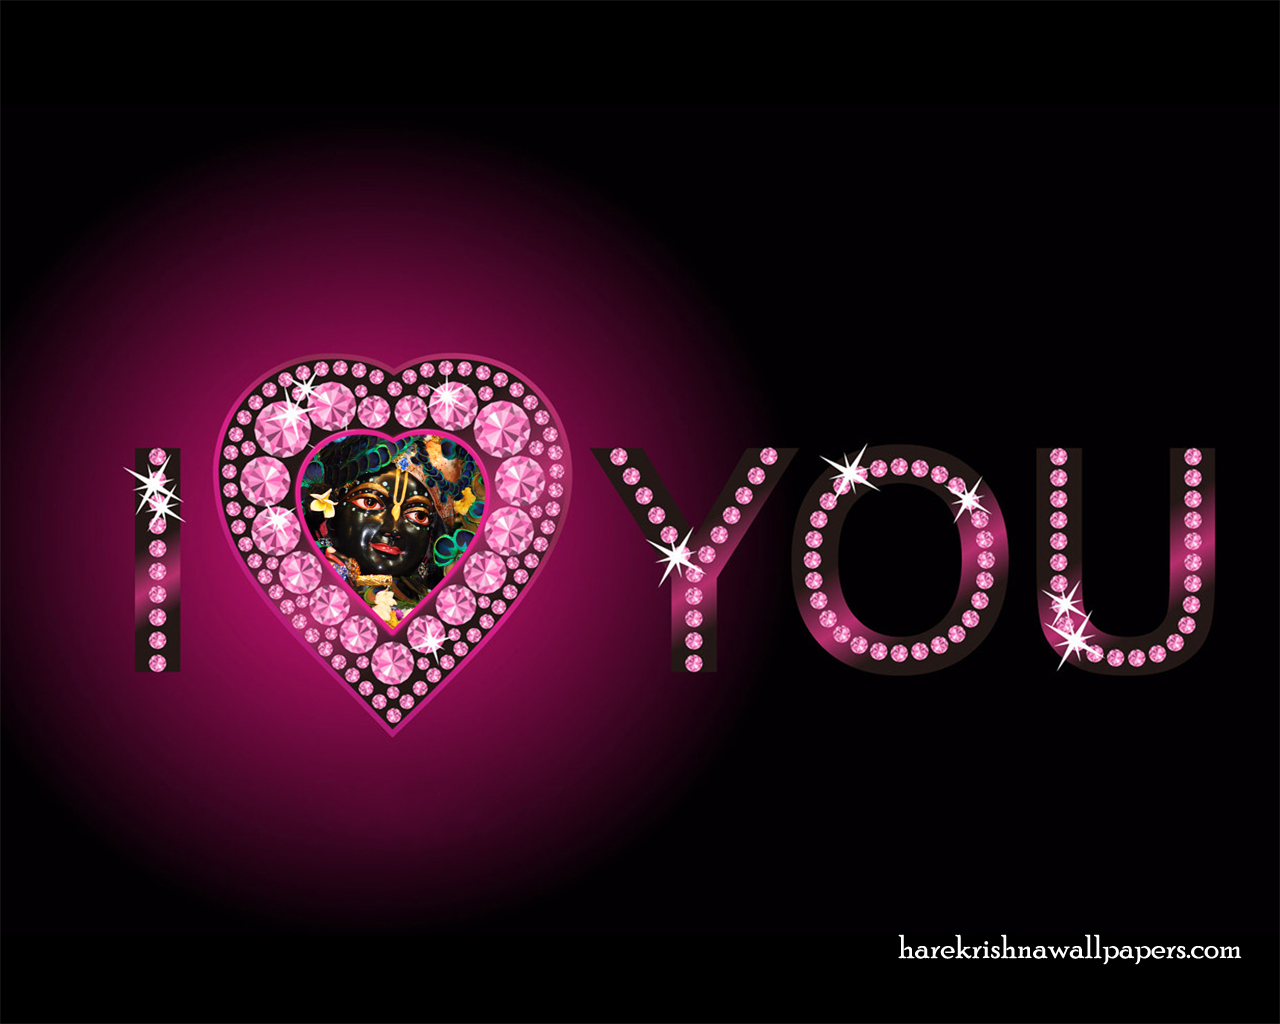 I Love You Shyamsundar Wallpaper (003) Size 1280x1024 Download